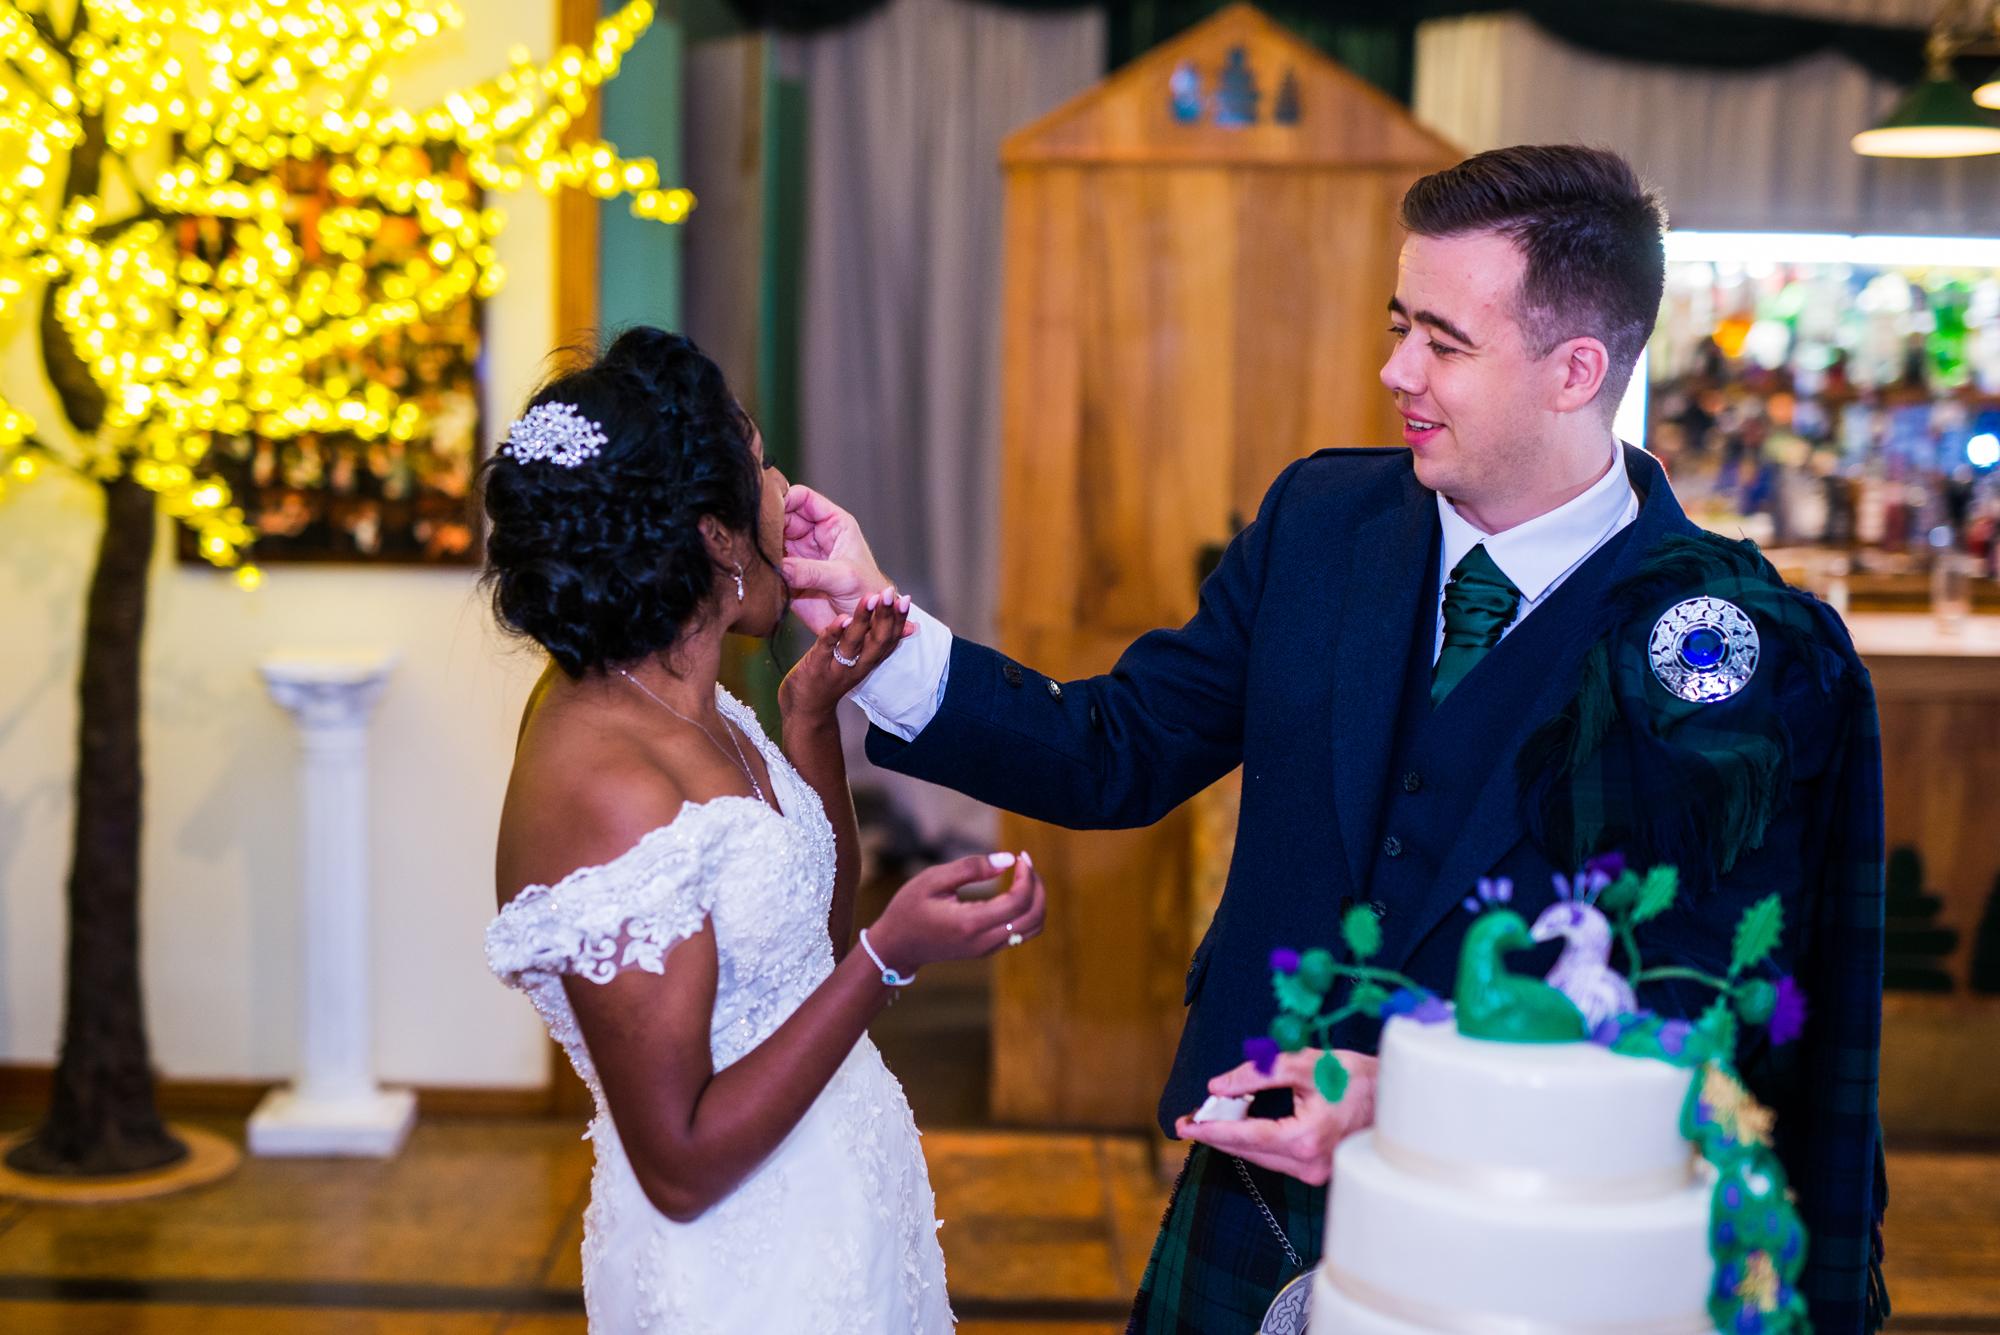 Kev and Shrabani wedding photos (318 of 350).jpg